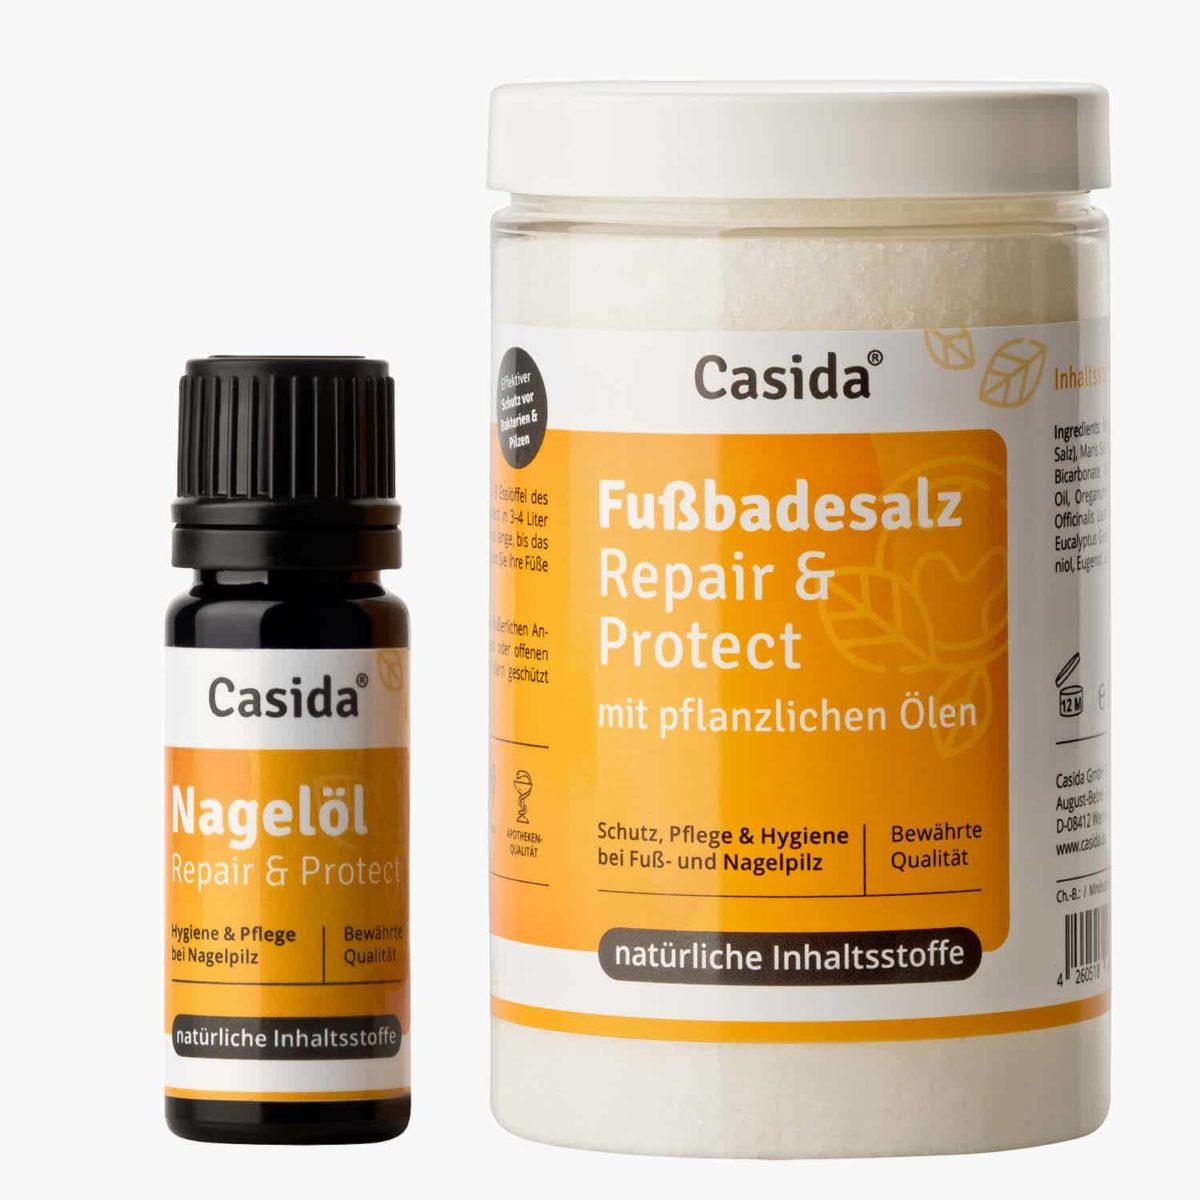 Casida Product Combo Nail Oil and Foot Bath Salt Bundle PZN 10022445 12907018 Nagelpilz bekämpfen pflanzlich Fußpilz